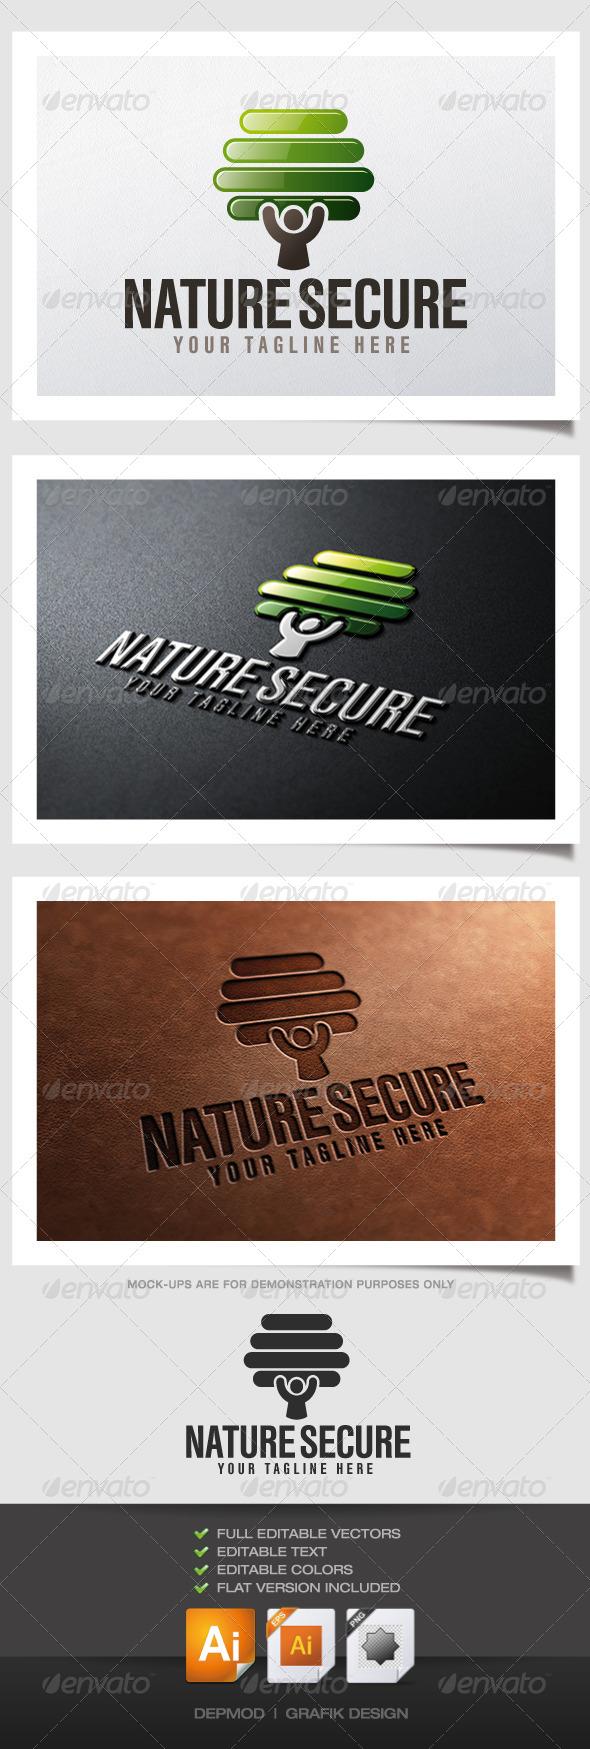 GraphicRiver Nature Secure Logo 4640666